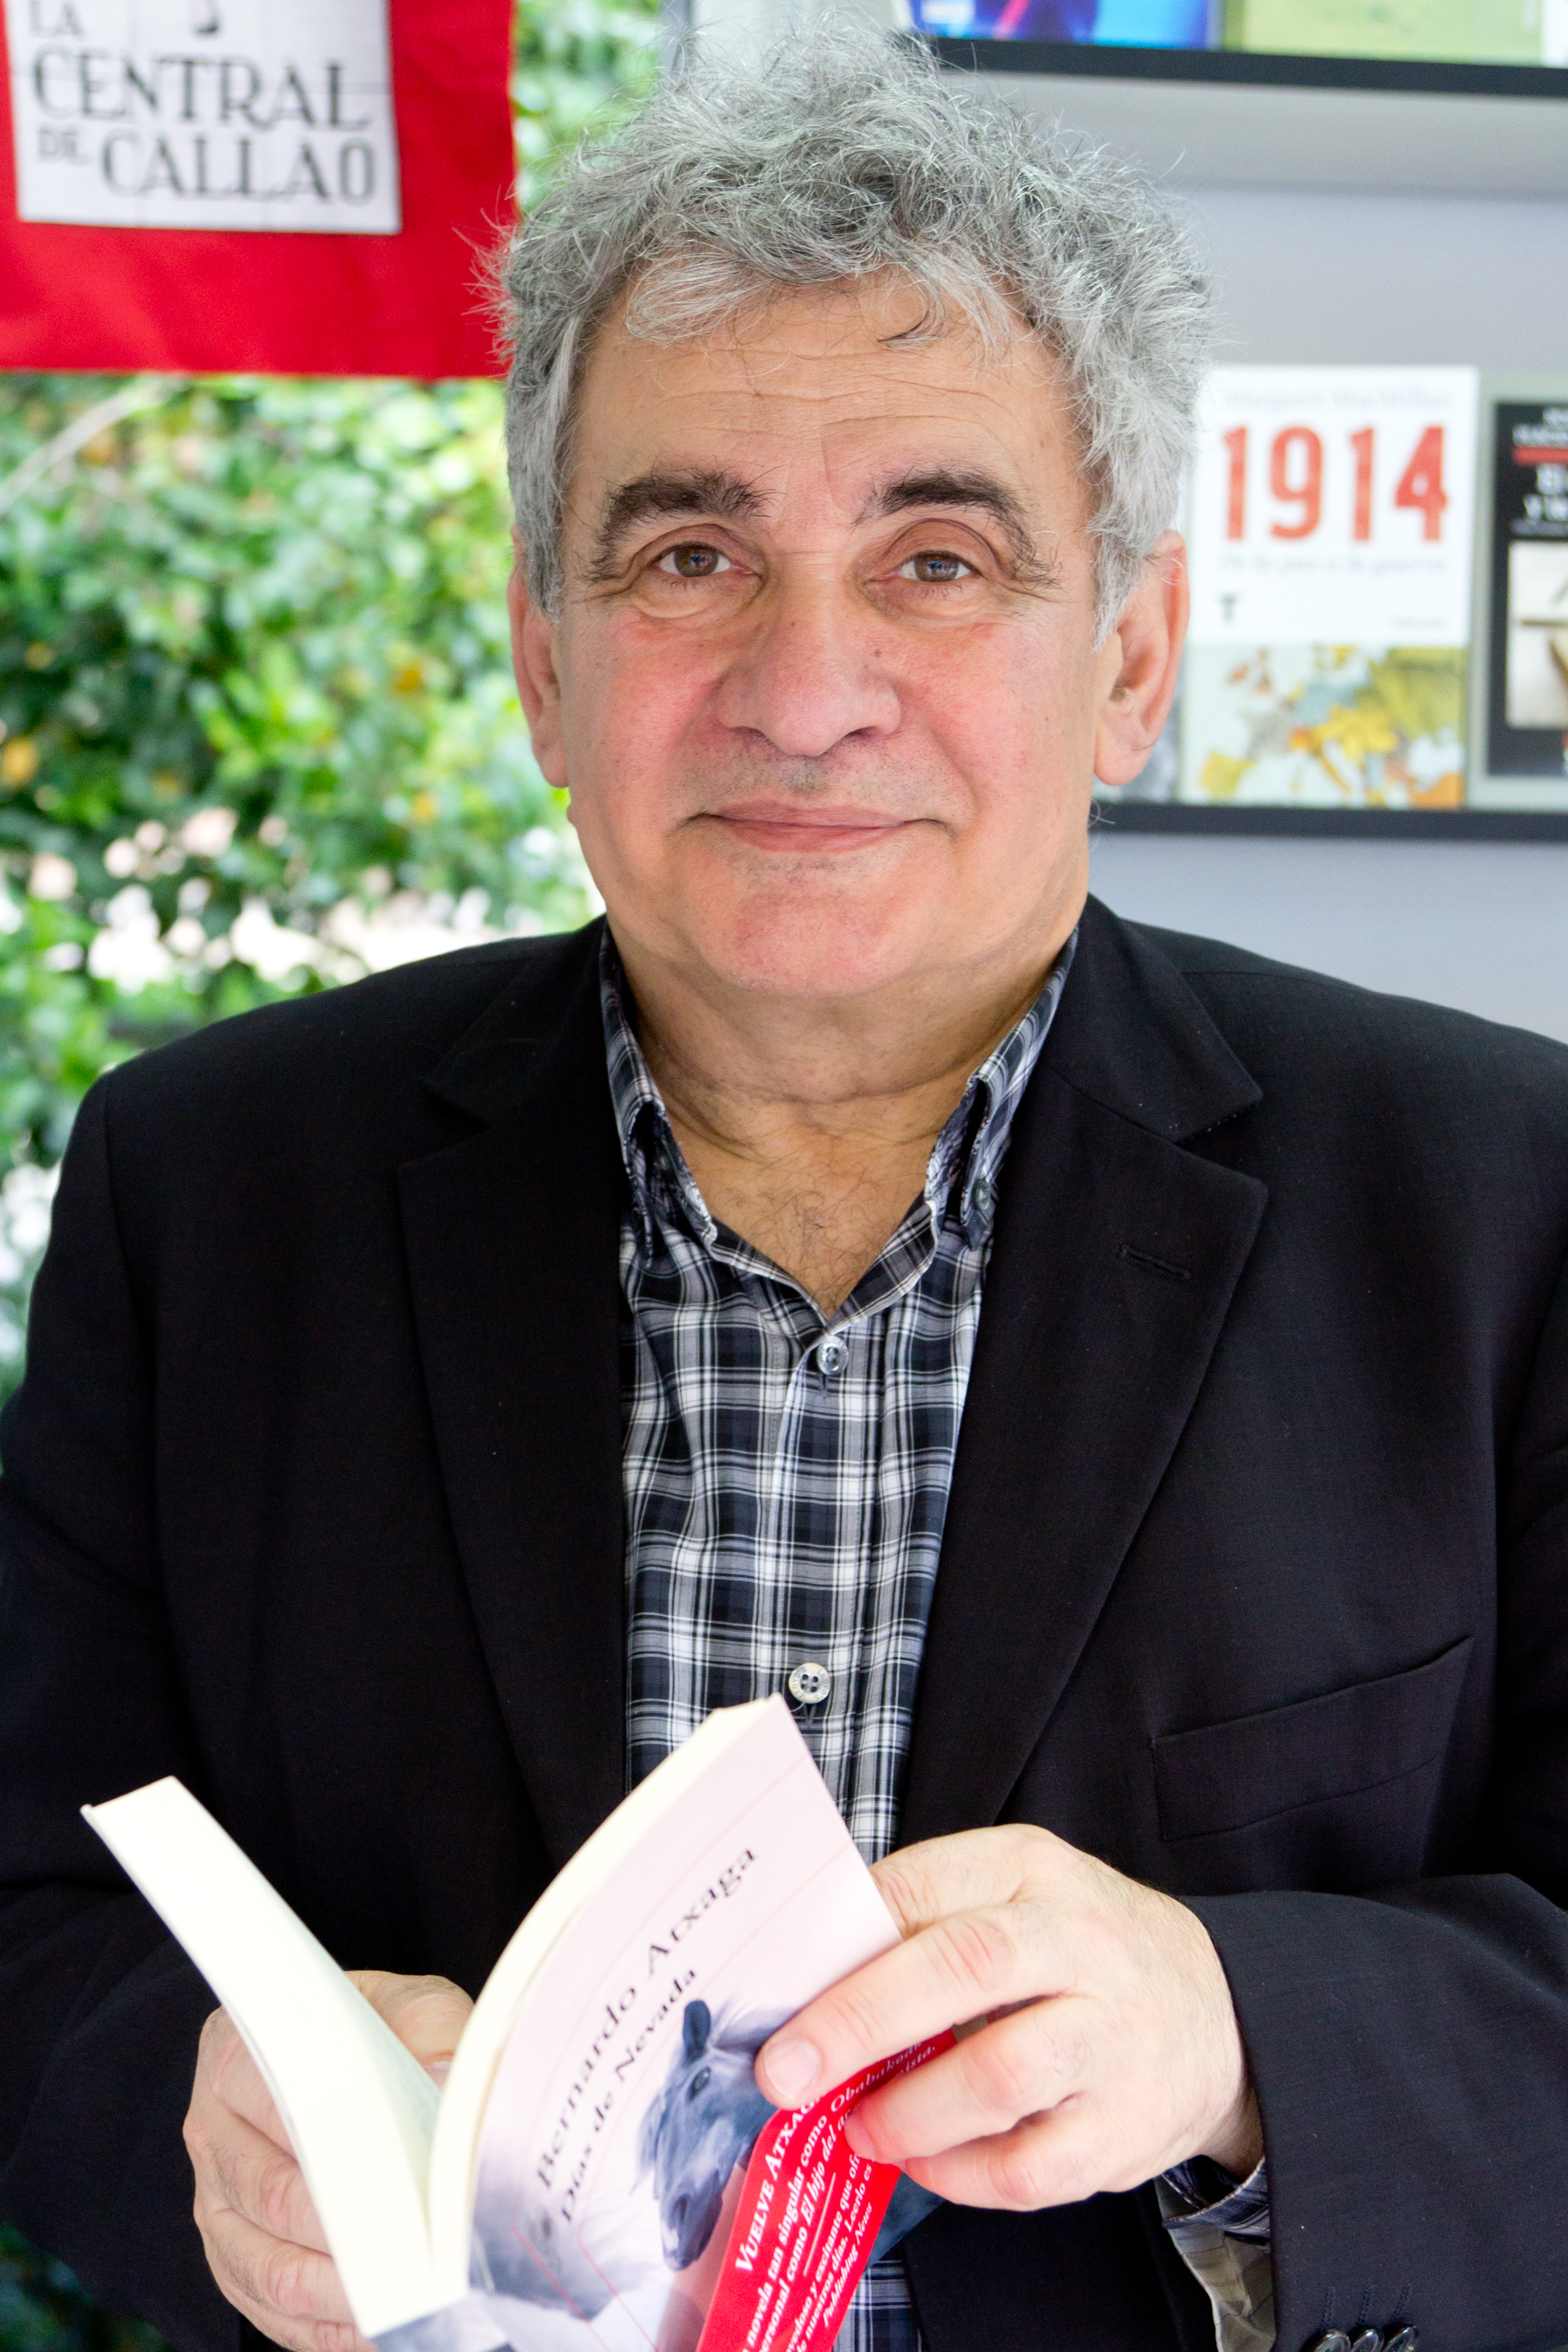 Bernardo Atxaga en la Feria del Libro de Madrid 2014.